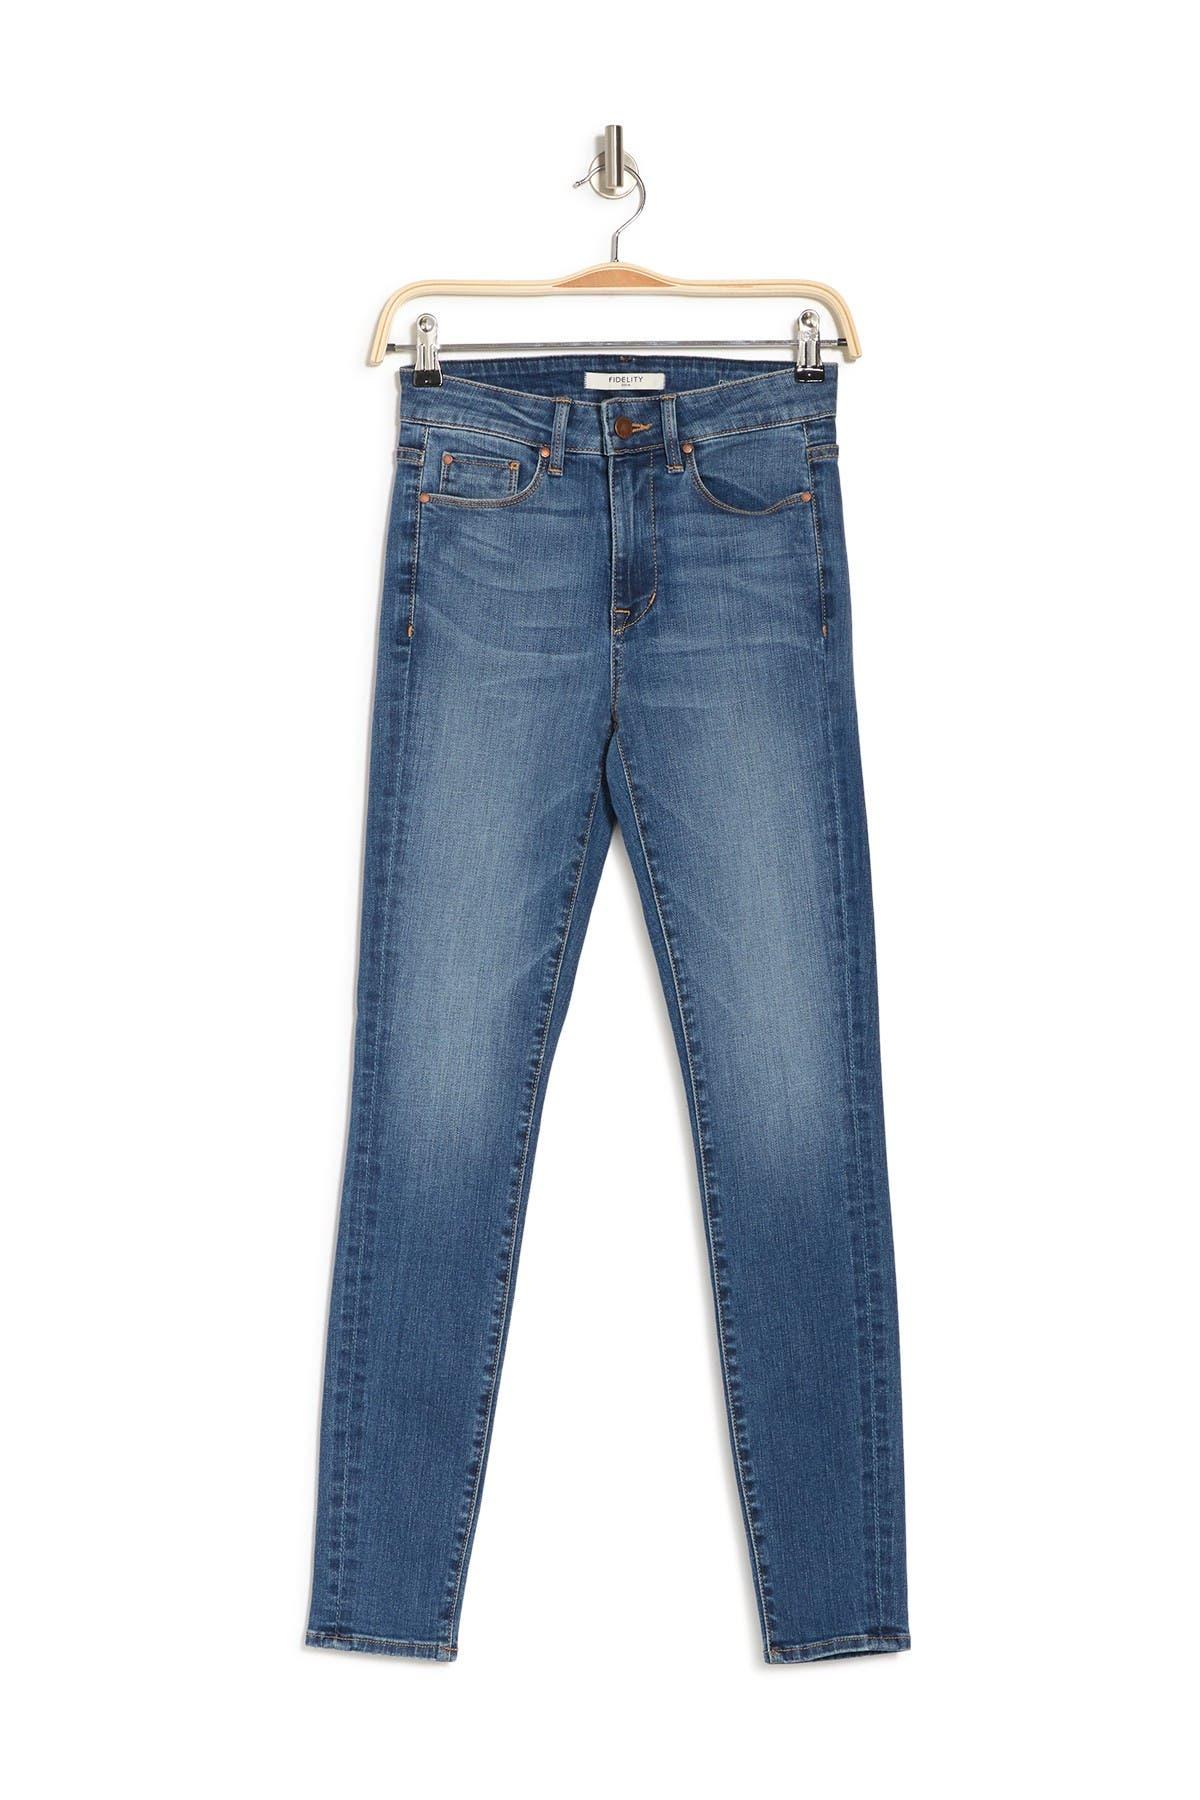 Fidelity Denim Jeans GWEN HIGH RISE SKINNY JEANS